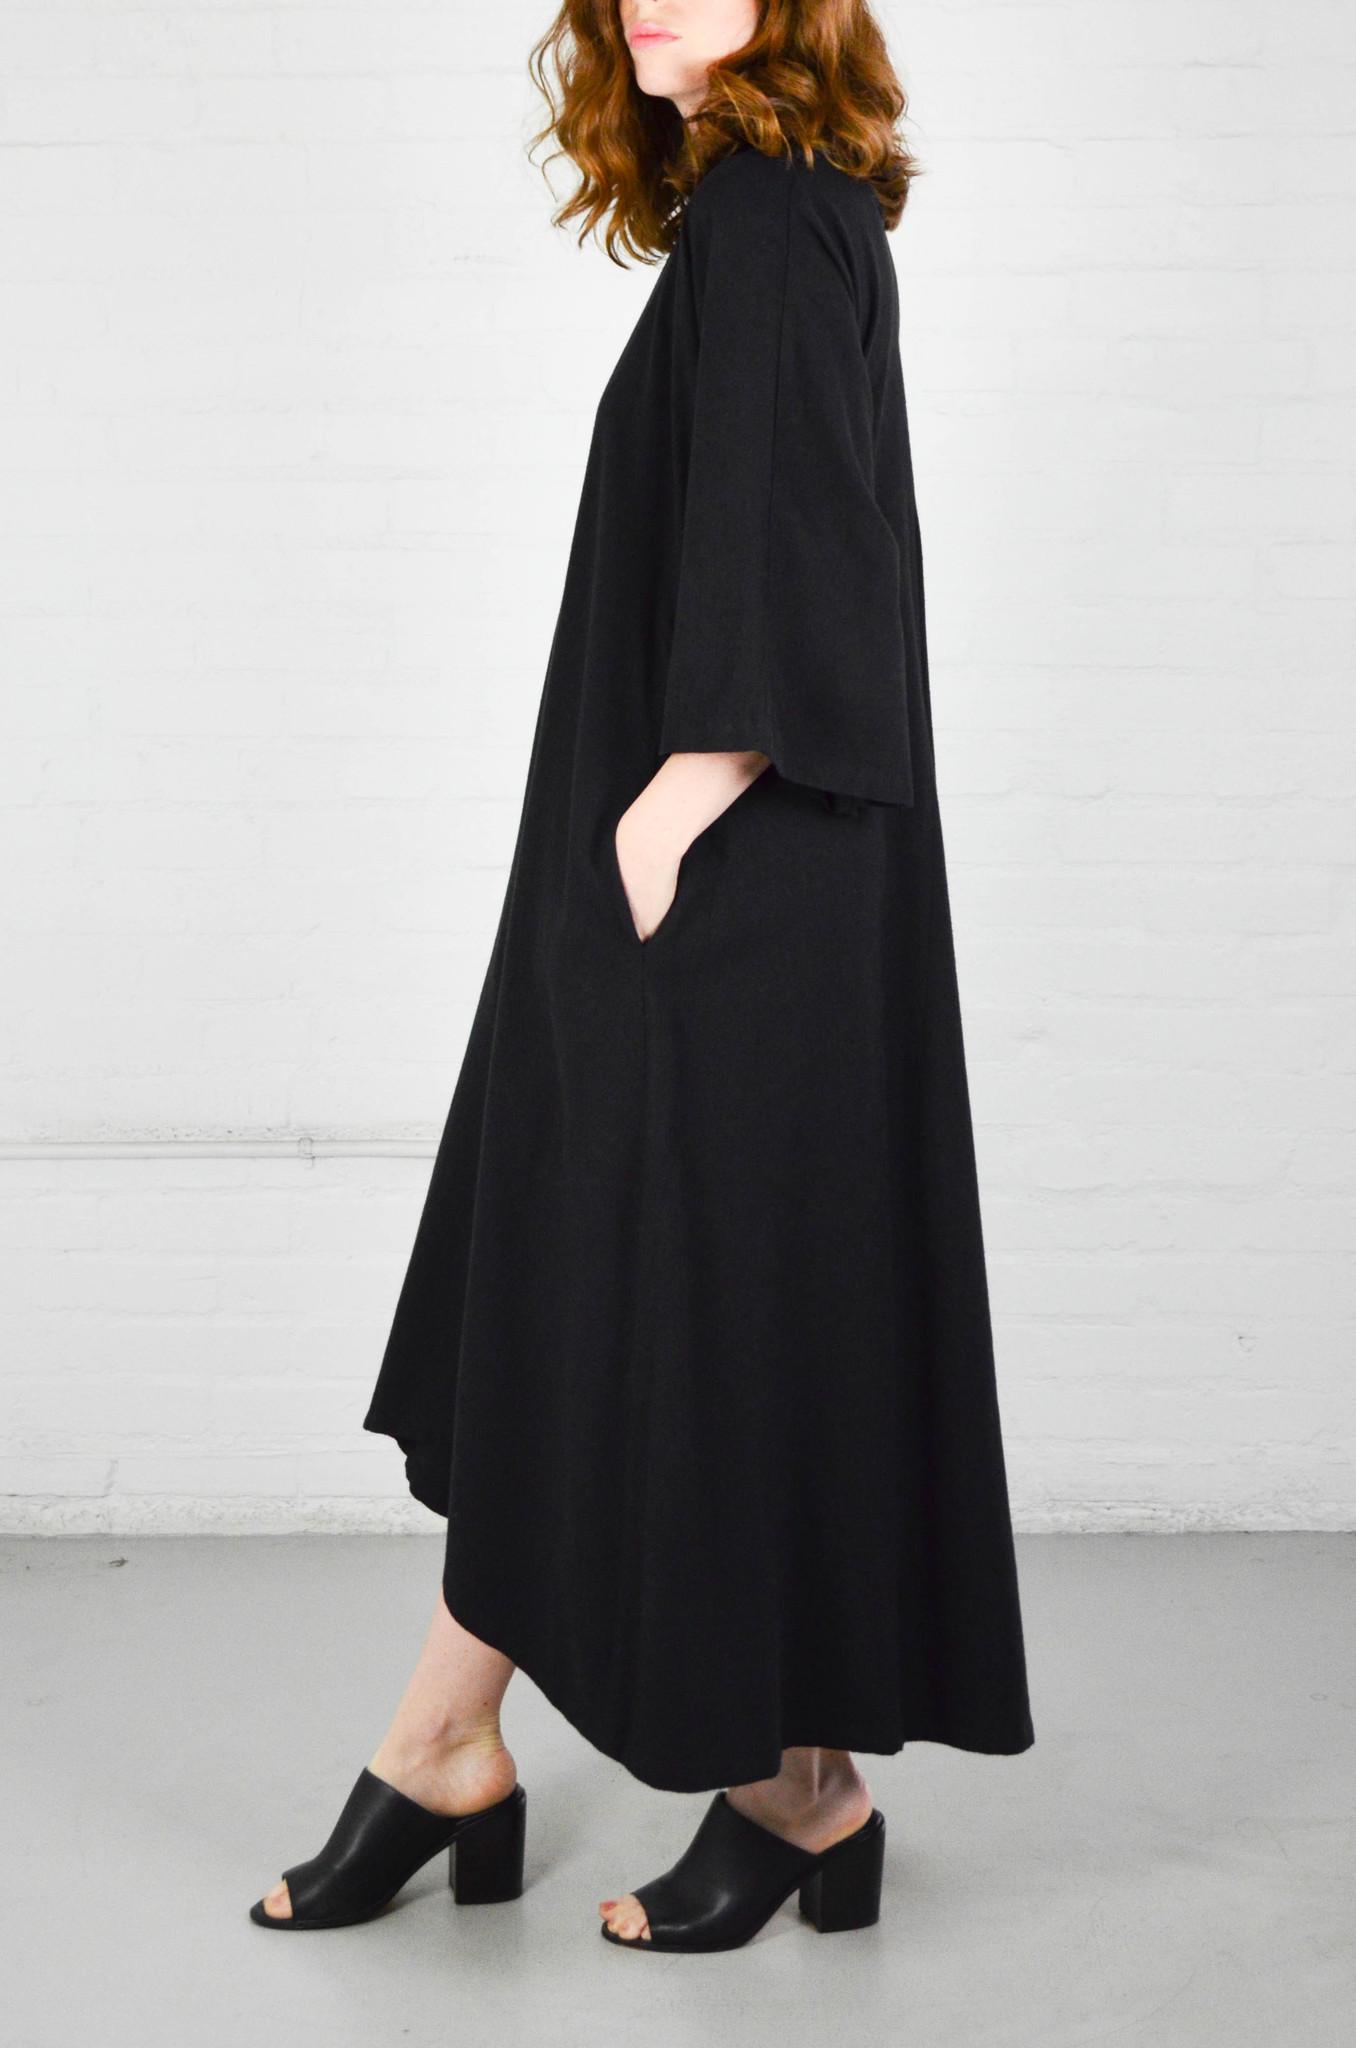 Black Crane Black Origami Dress Garmentory